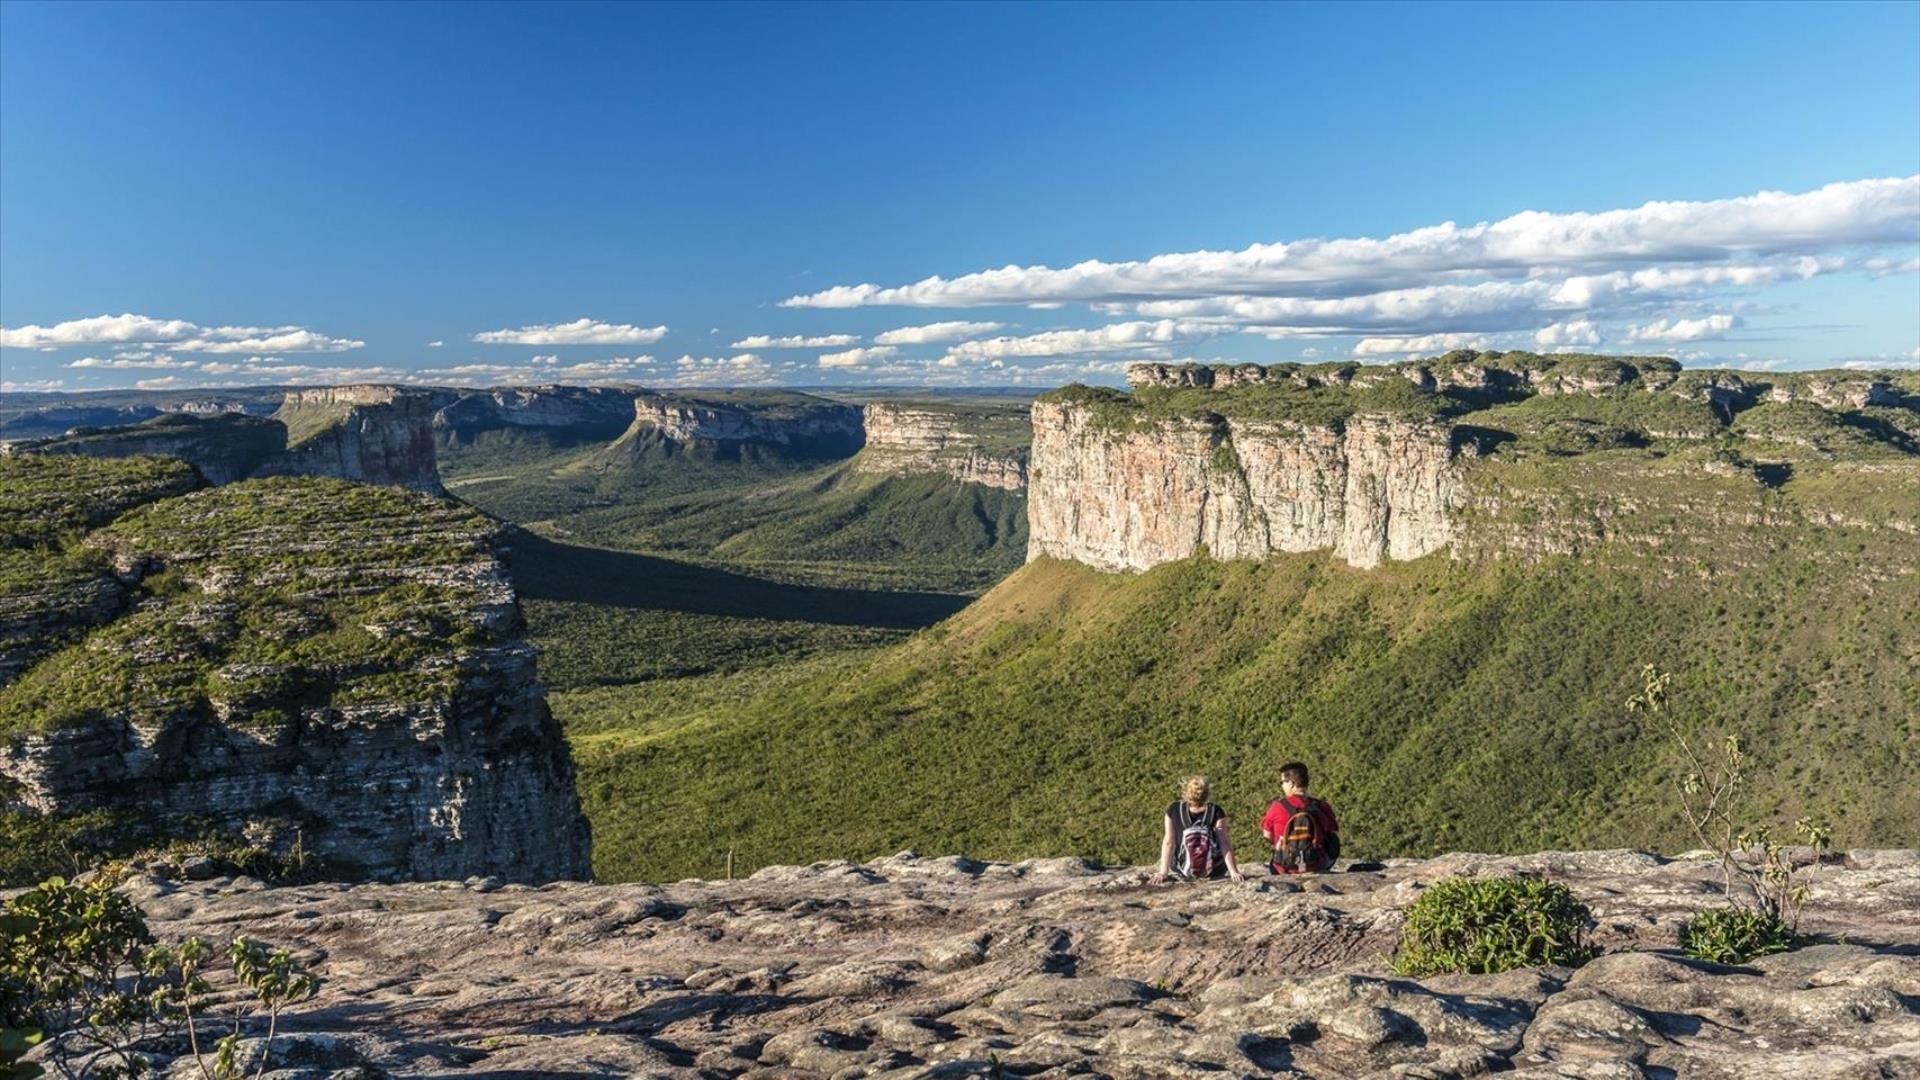 Brasilien | Salvador, Chapada Diamantina, Dendeküste, Imbassai: 13 Tage Aktivreise - Wanderparadies Brasilien